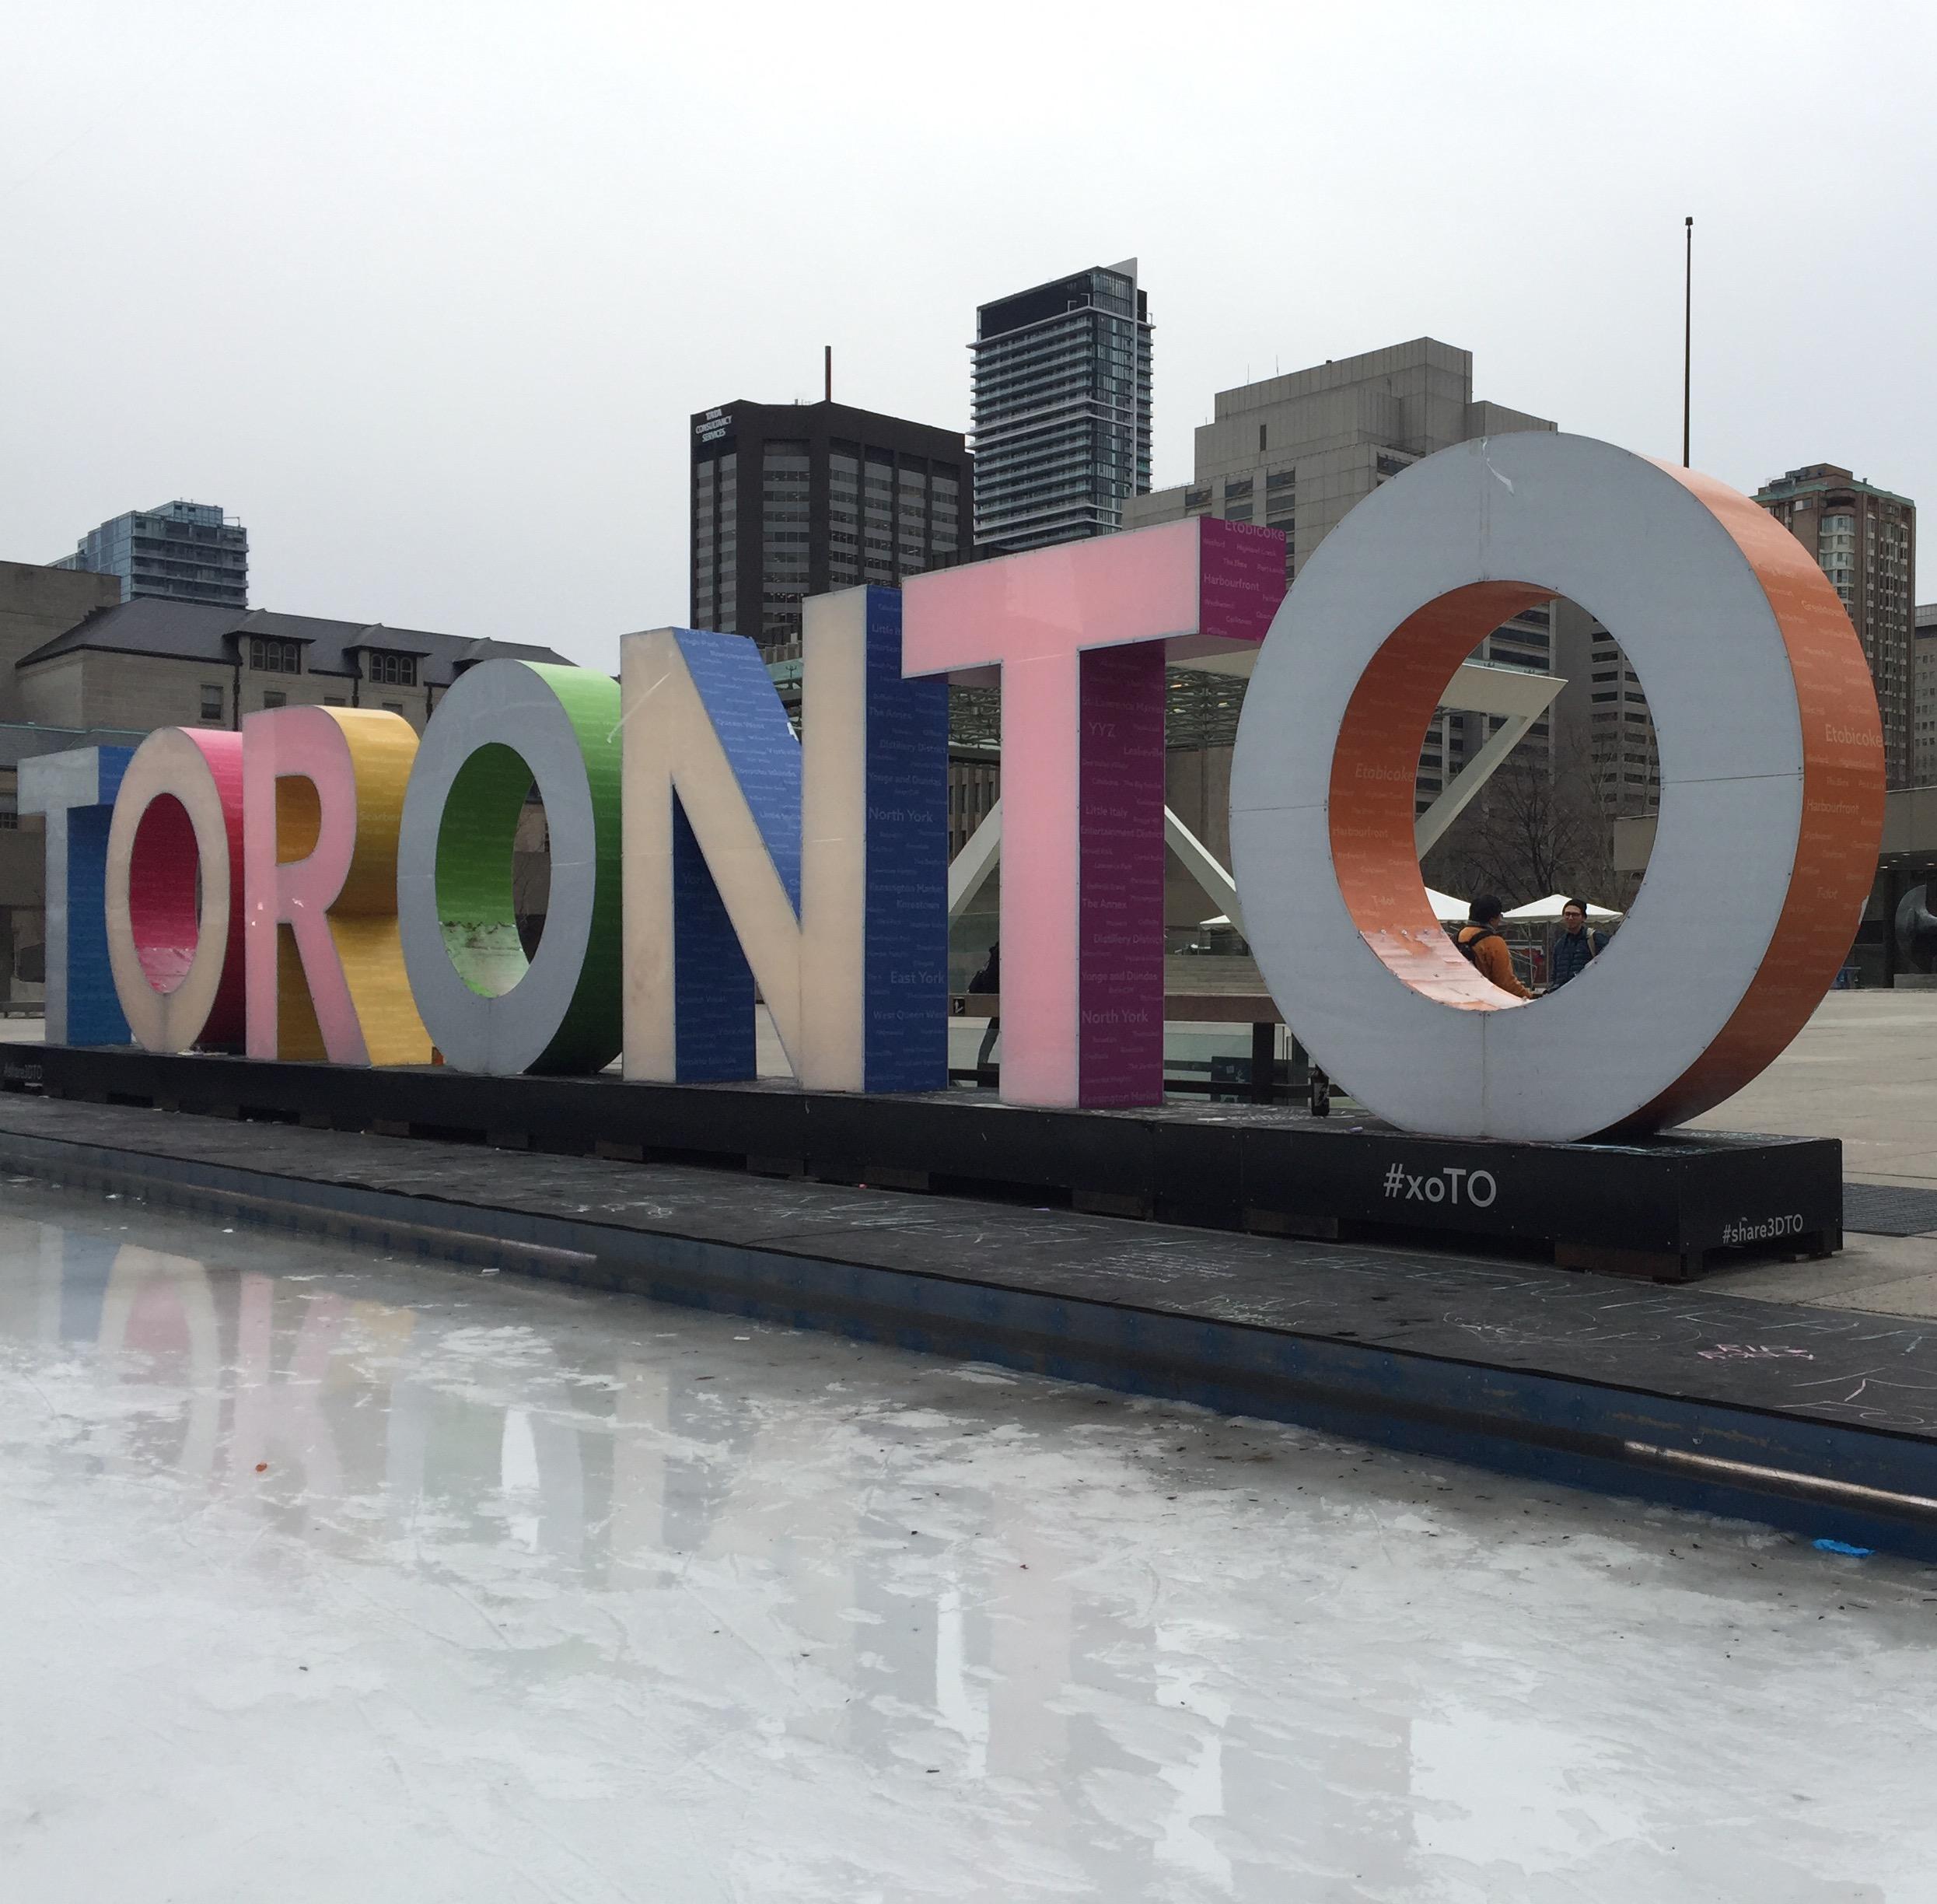 The Toronto sign at Nathan Phillips Square. CITYNEWS/Diana Pereira